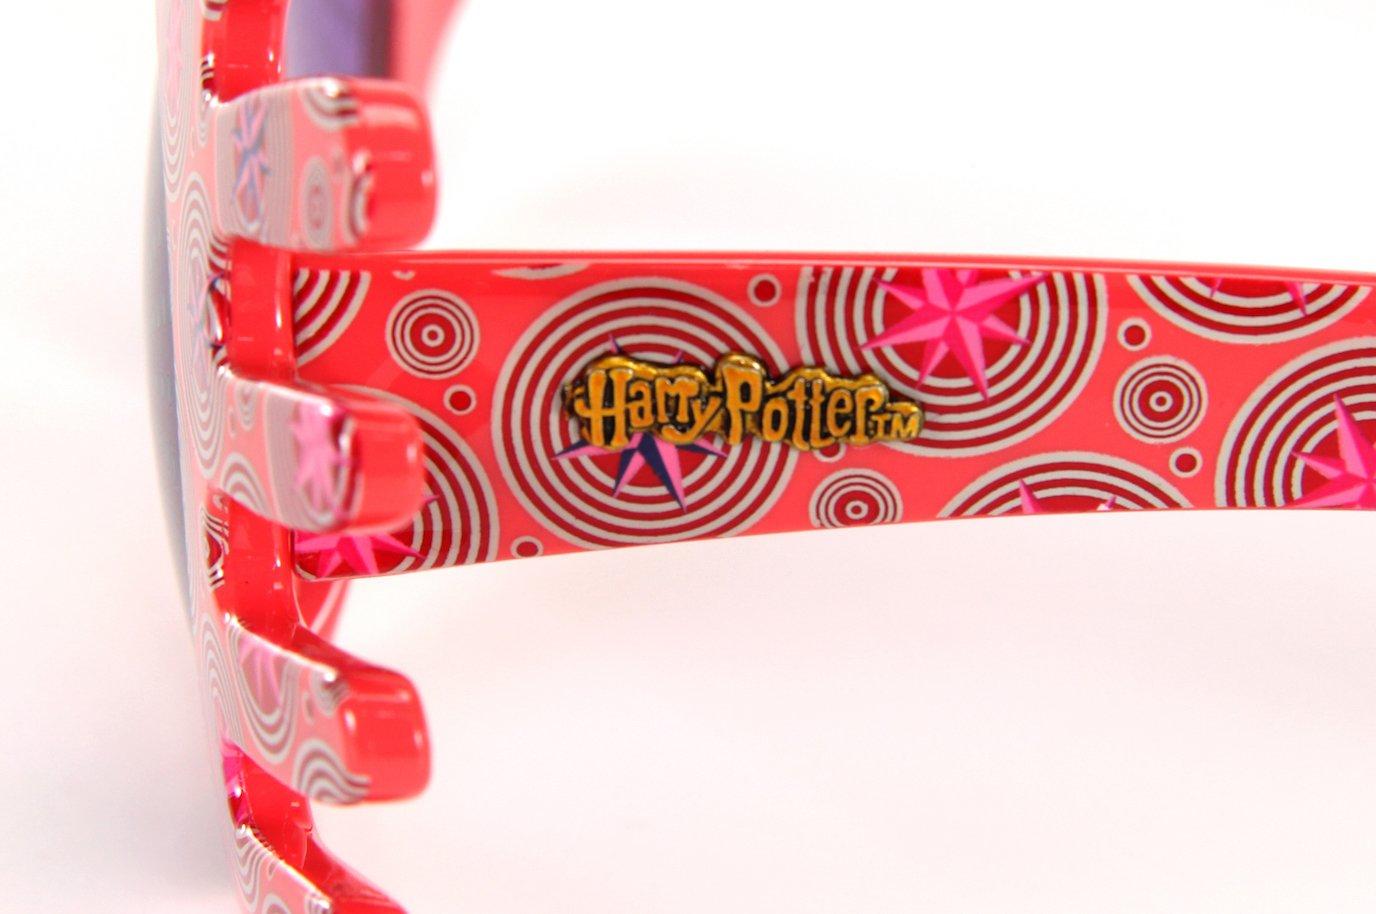 Elope Harry Potter Luna Lovegood Spectrespecs Costume Glasses Toys